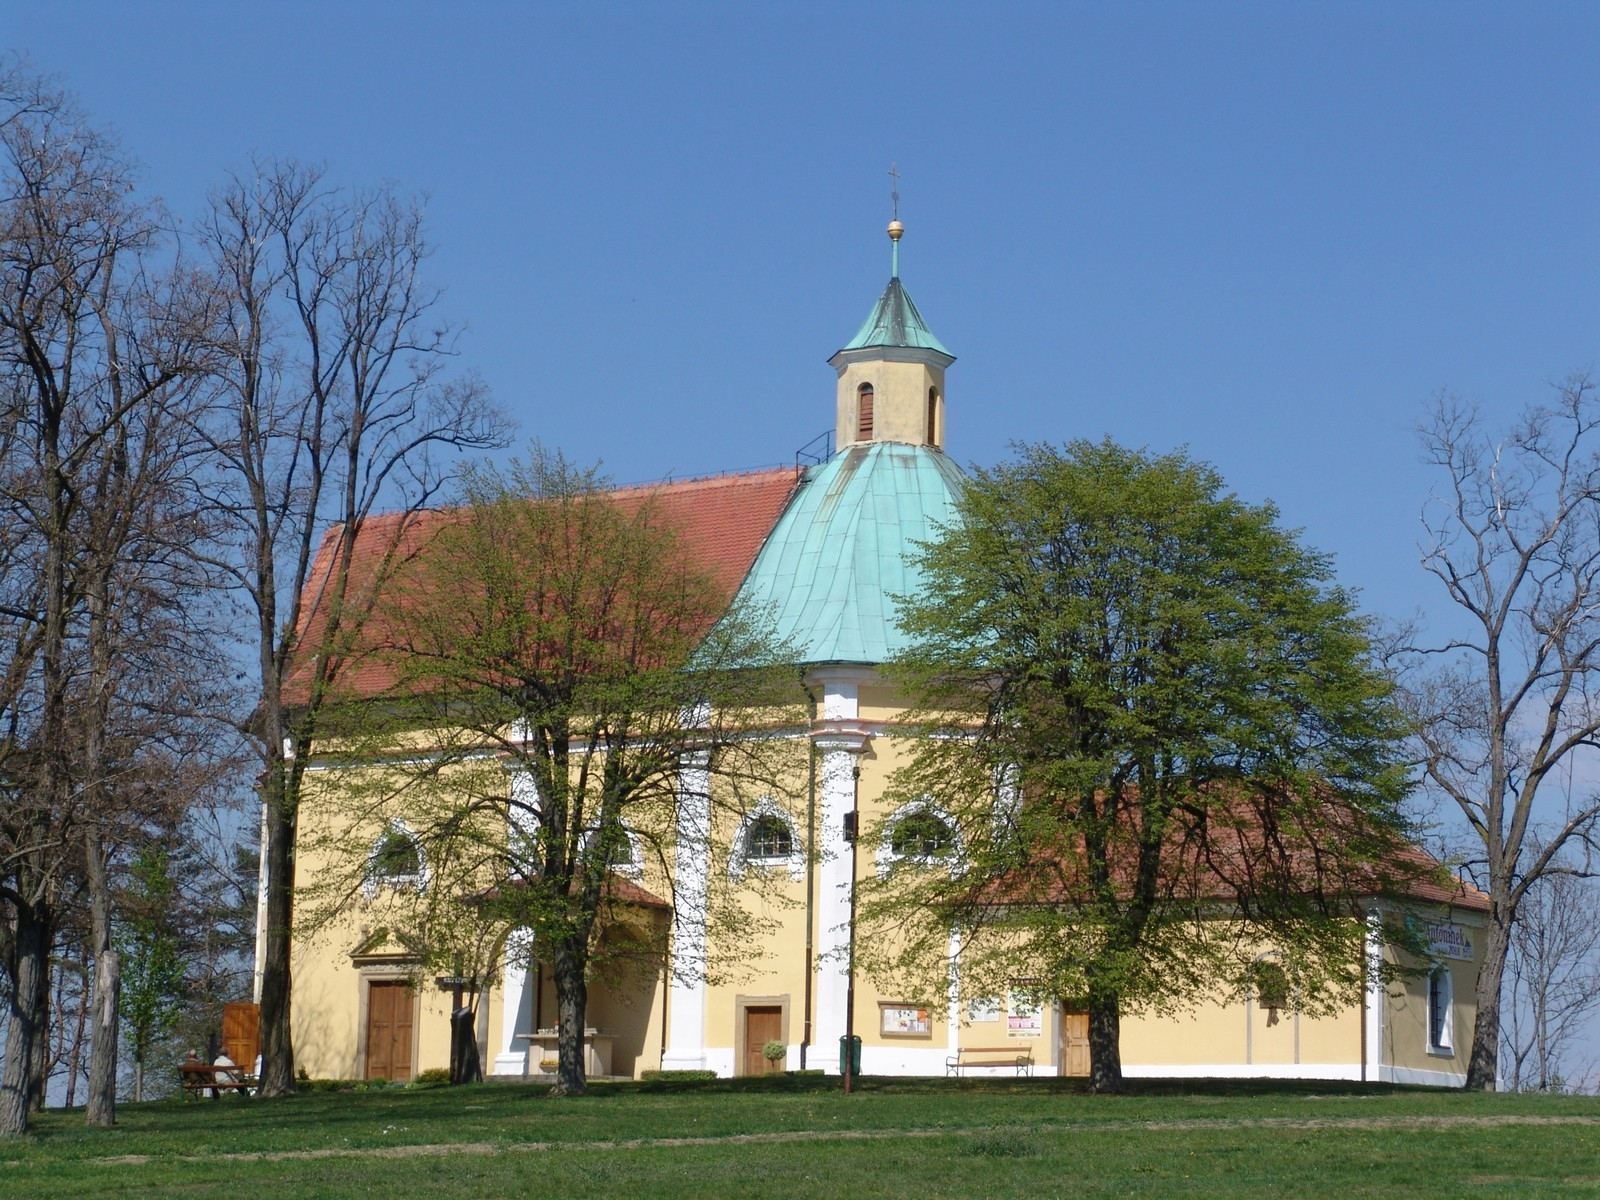 Kaple sv. Antonína